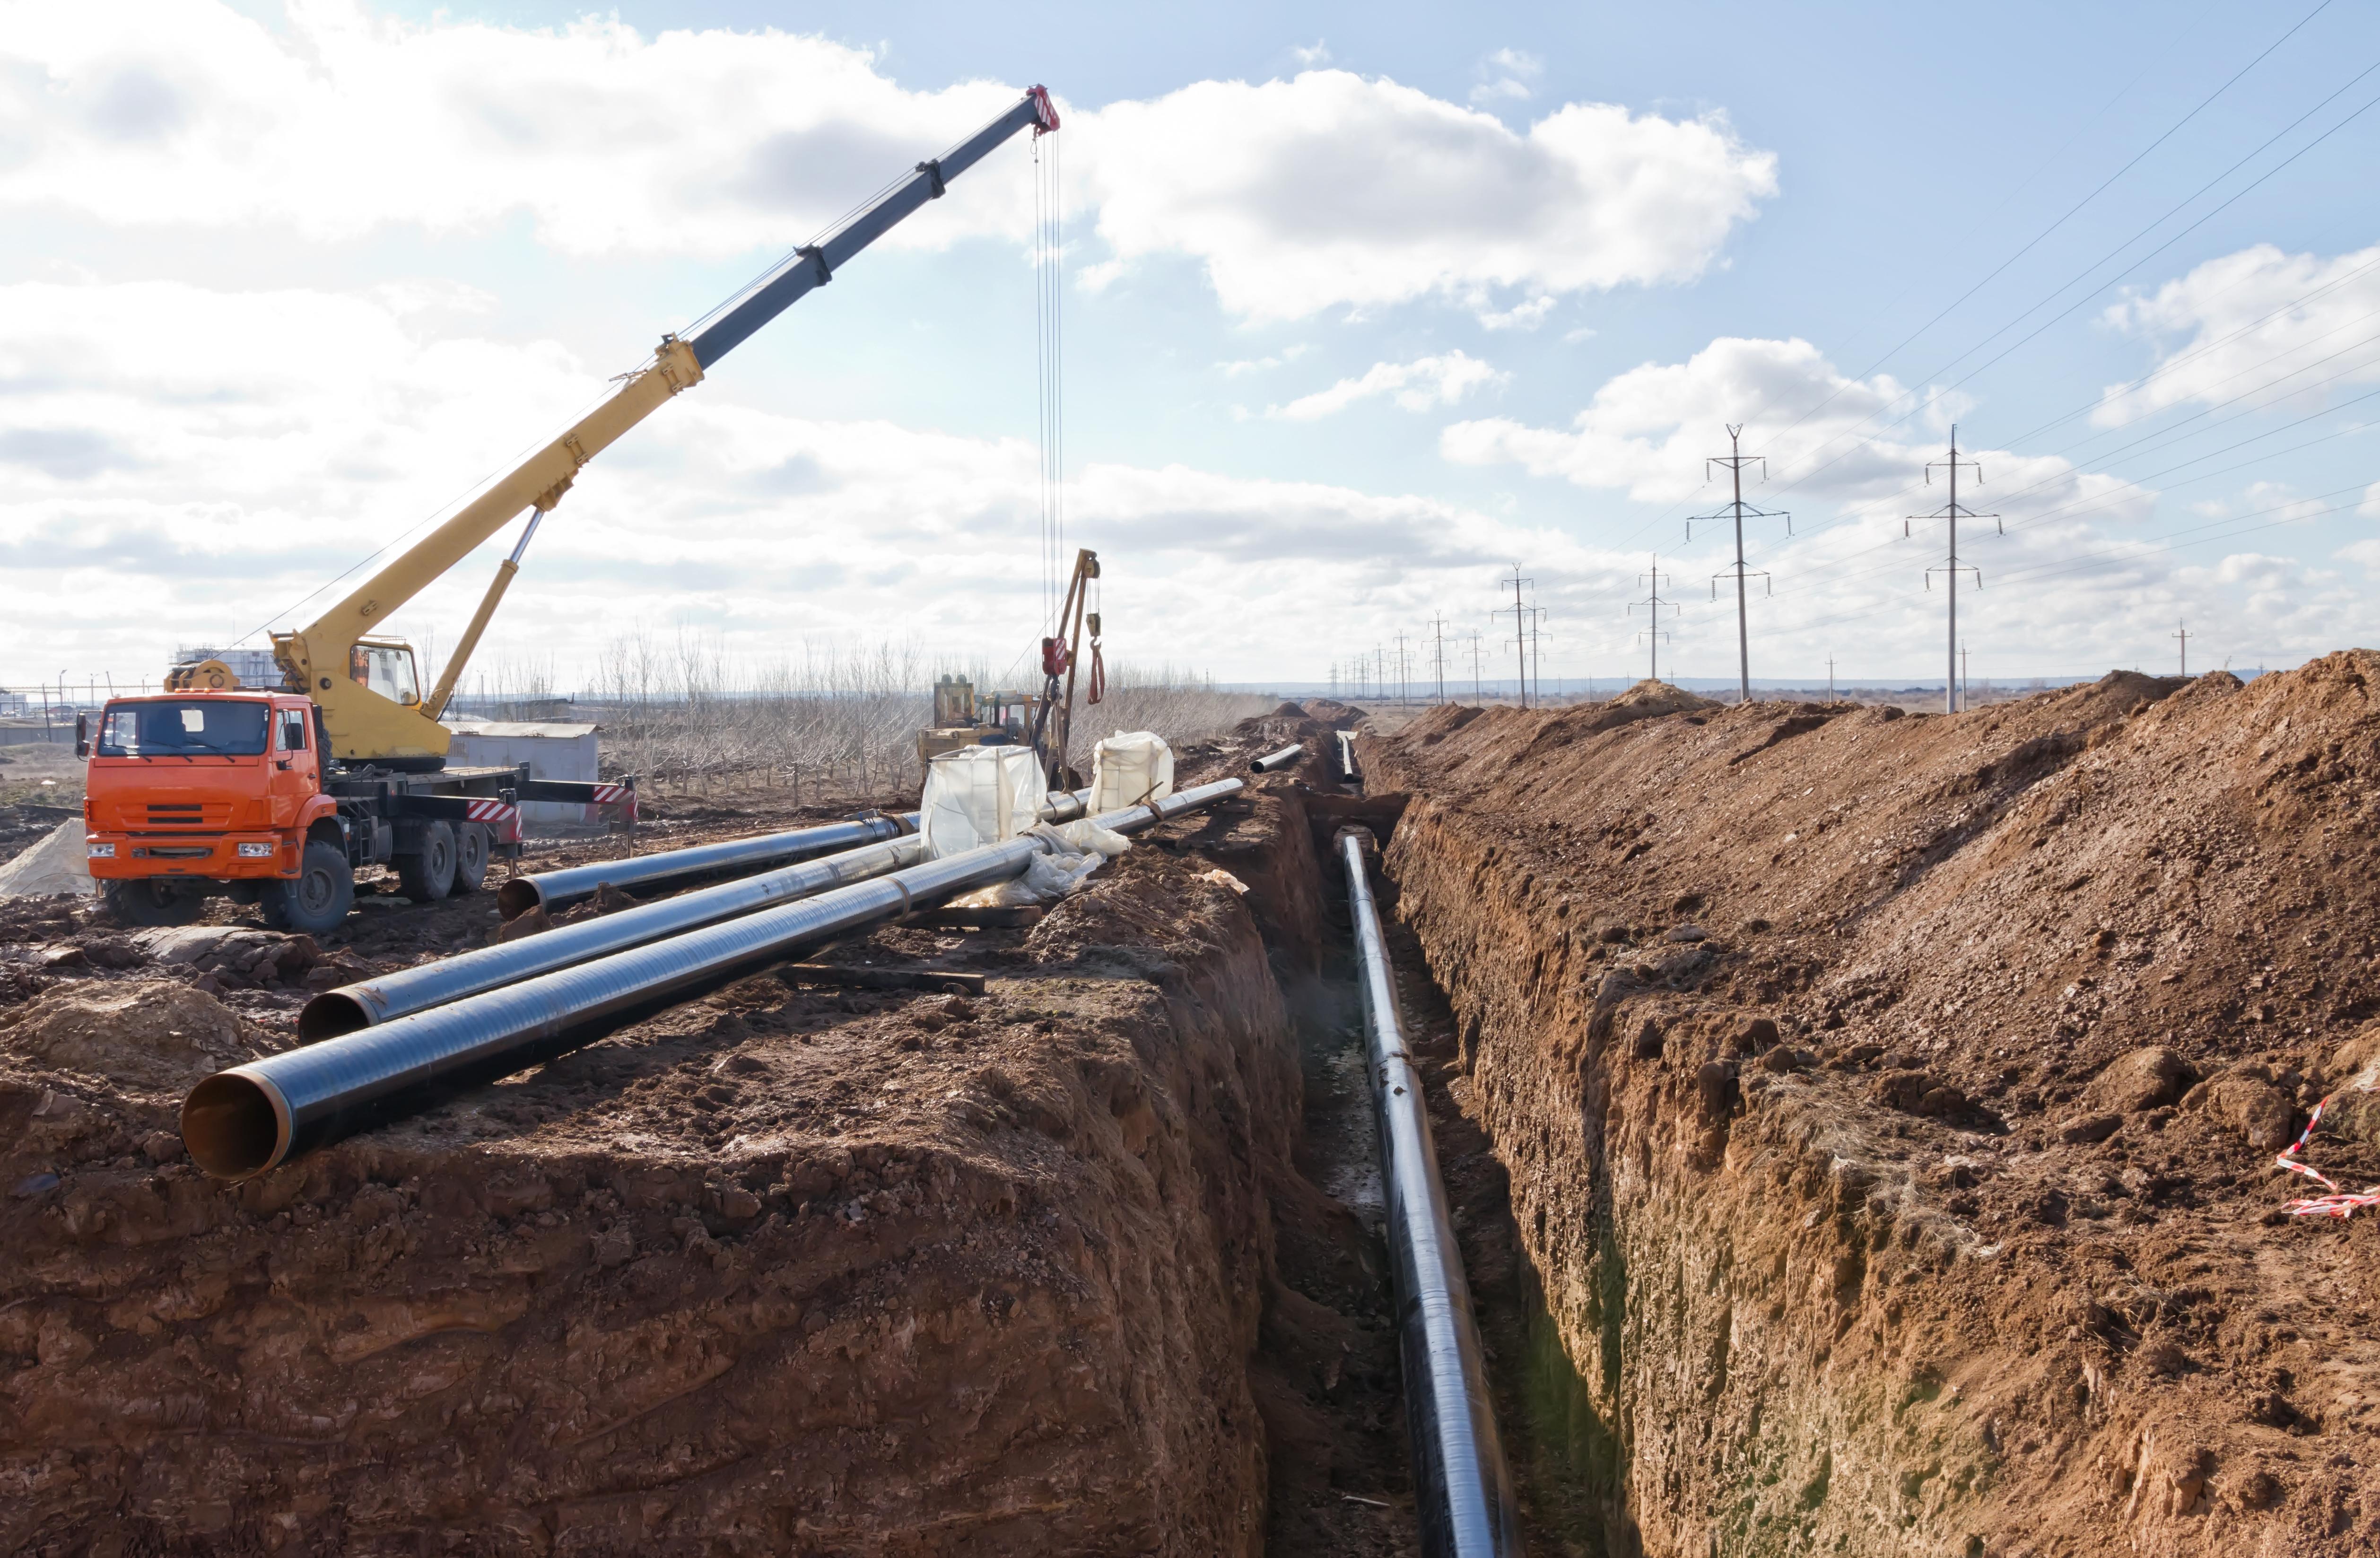 shutterstock_531889711_pipeline construction